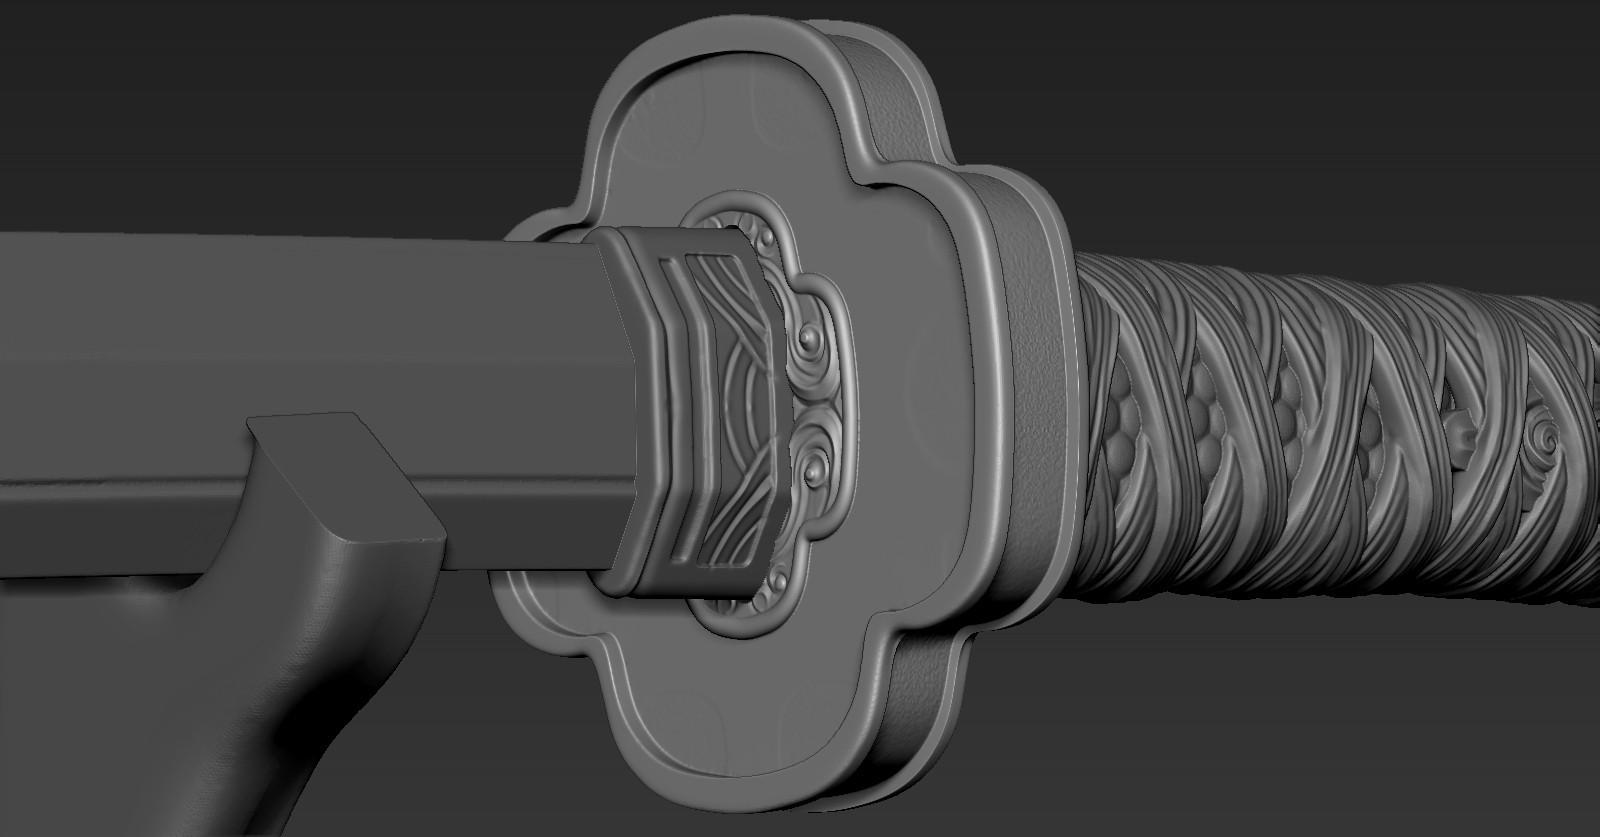 ZBrush Document04.jpg Download free STL file katana 01 • 3D printable template, Dynastinae